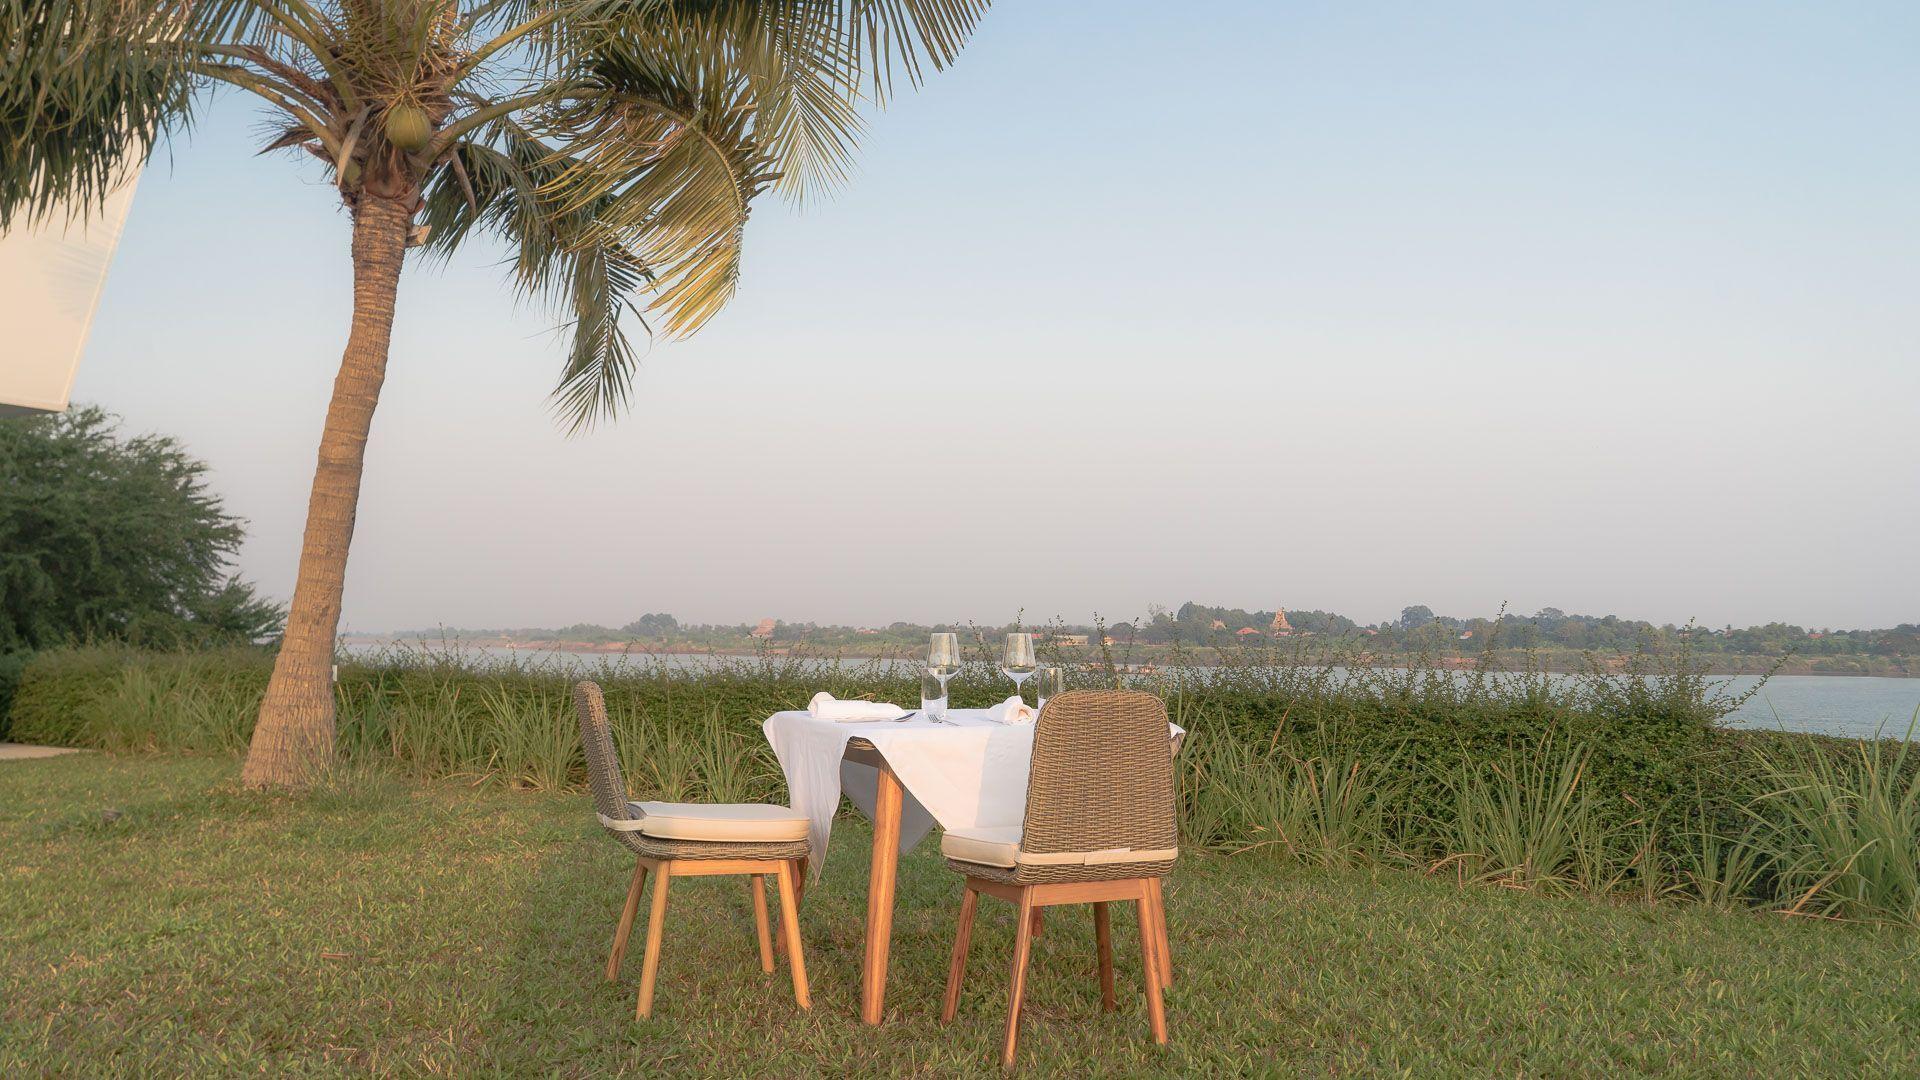 Lesvoyageuses-voyage-Phnom-Penh-cambodge-hotel-the-bale-experience-41